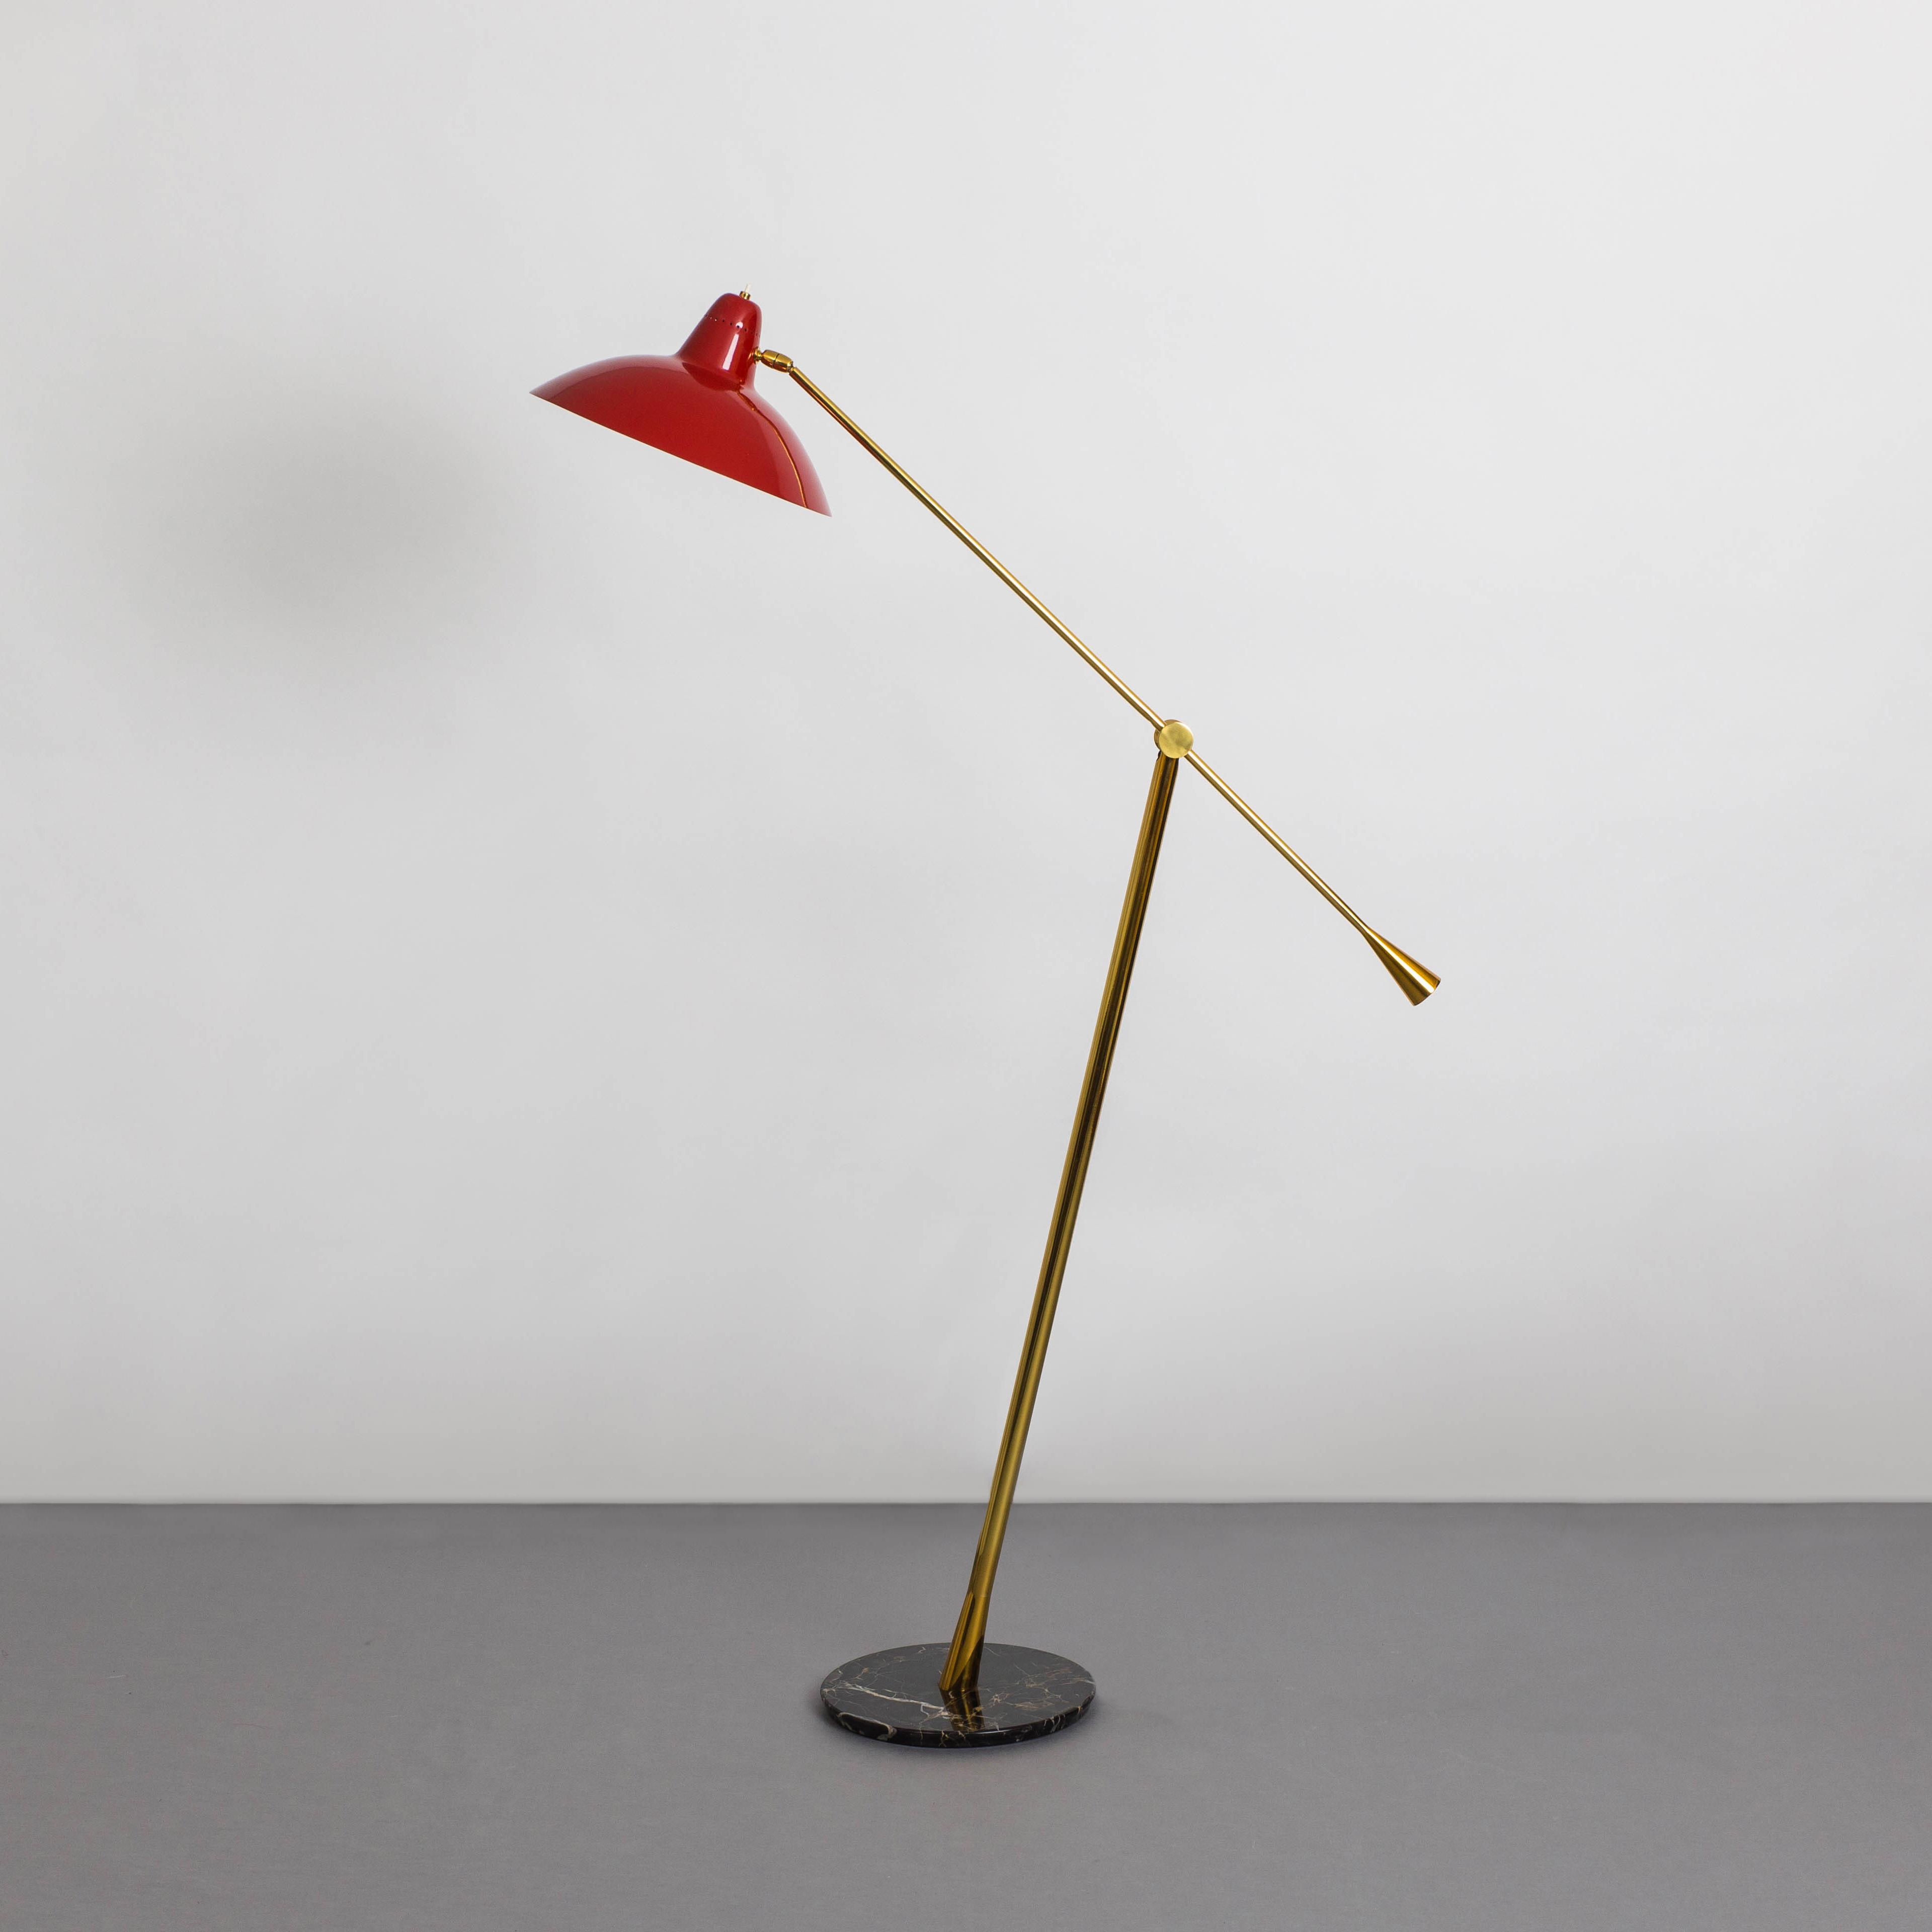 Articulating Floor Lamp by  | soyun k.